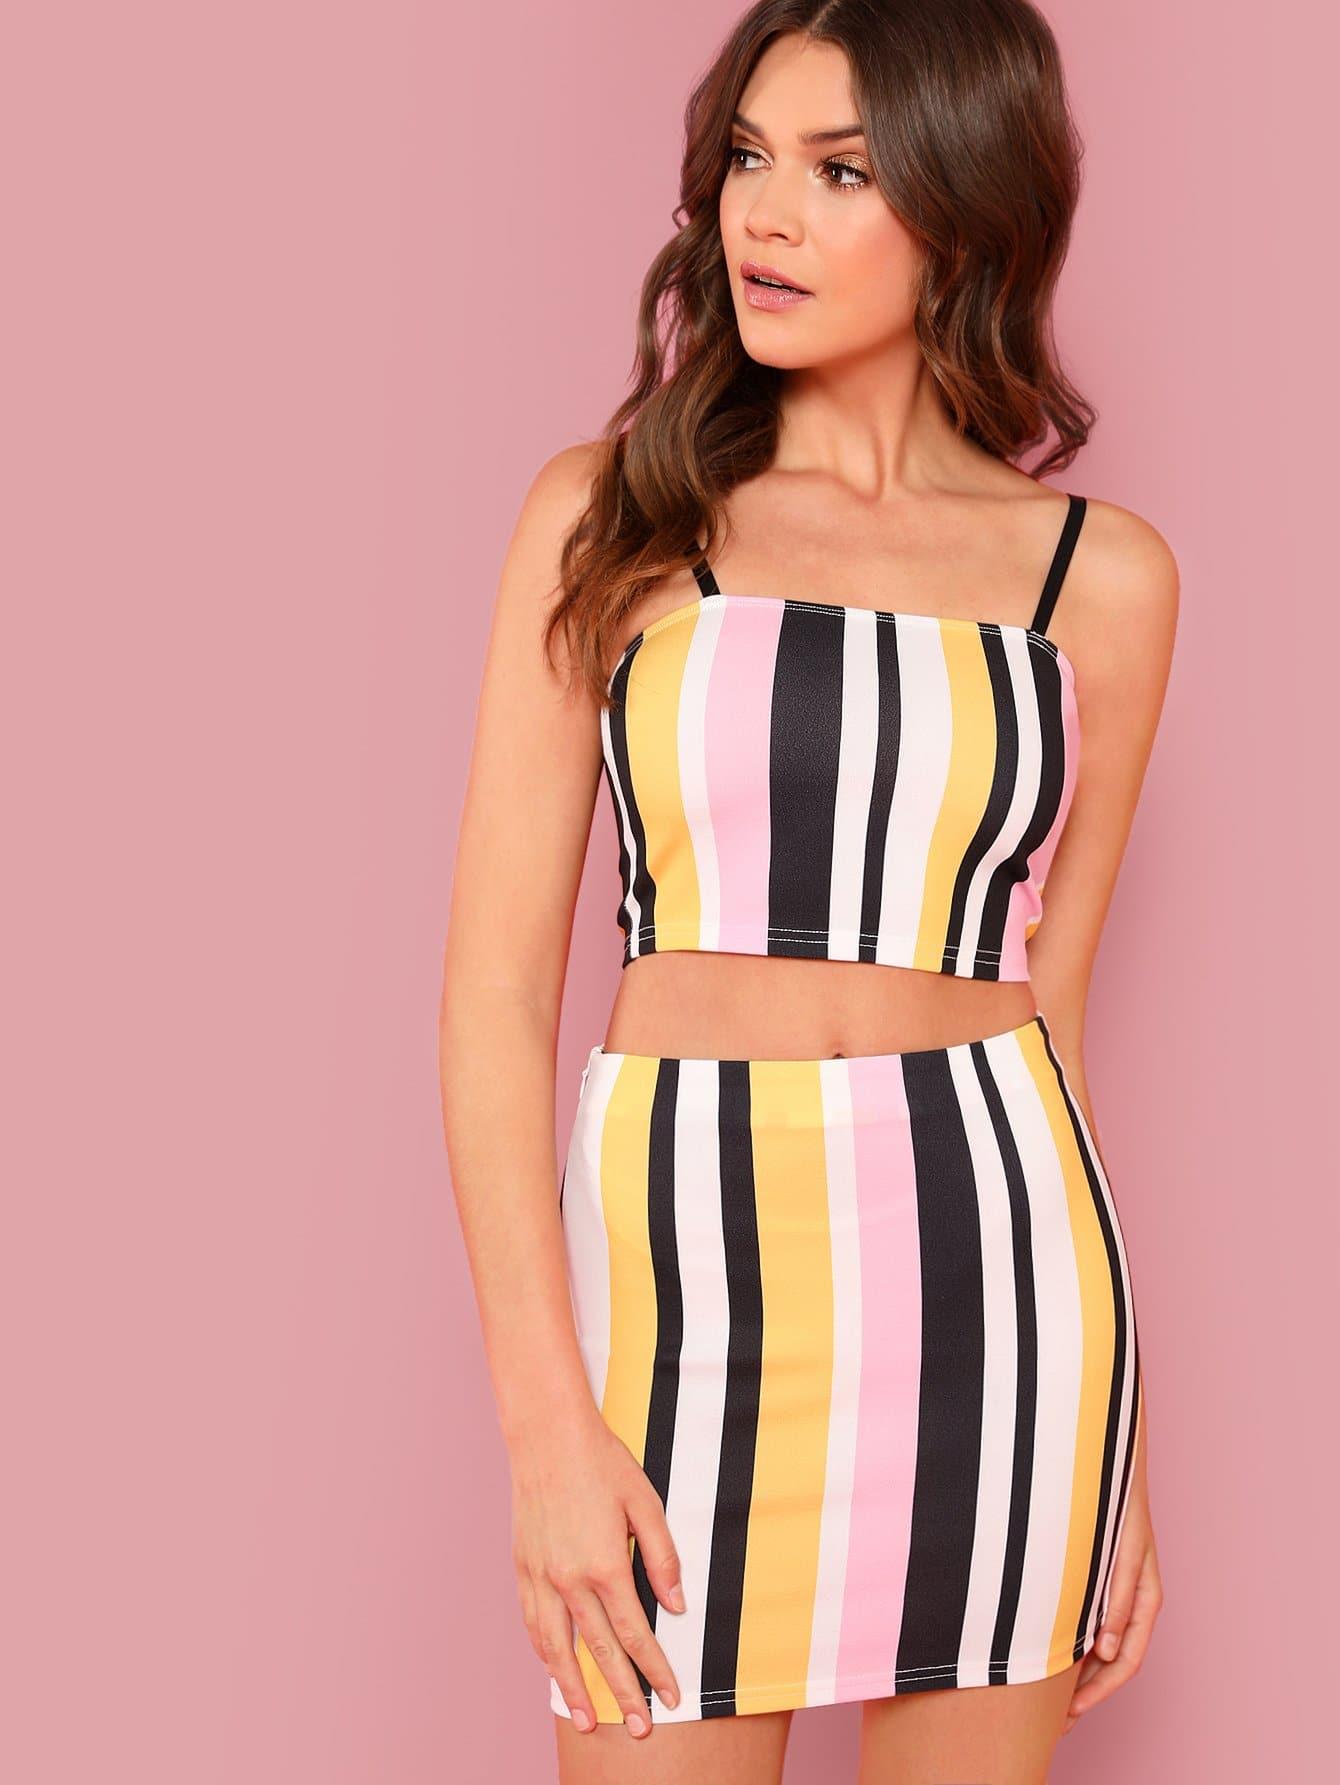 Striped Crop Cami Crop Top & Skirt Co-Ord black choker sleeveless crop top